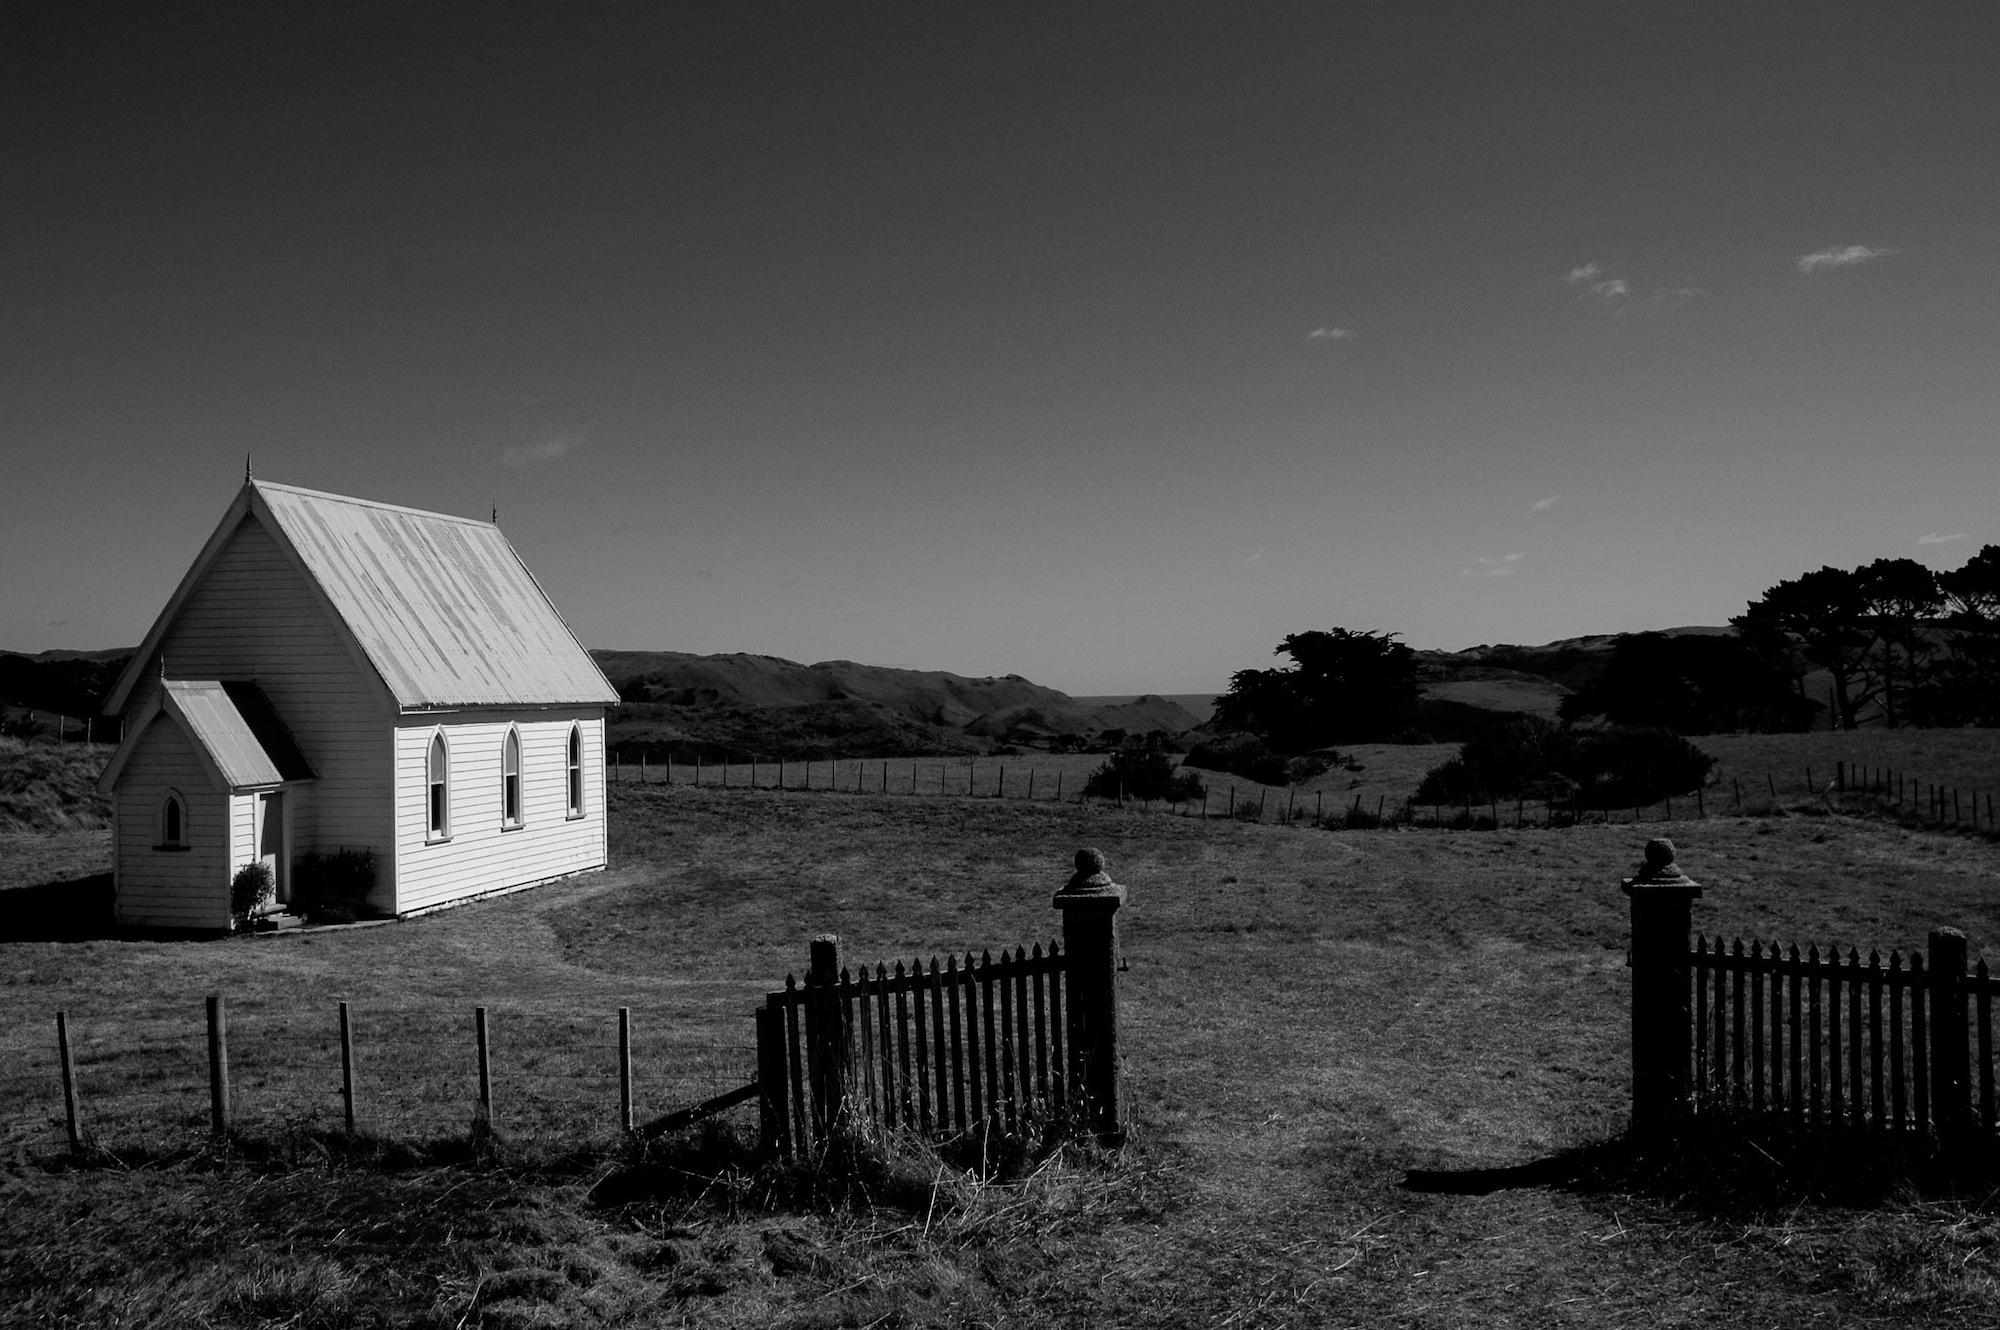 abandoned_house_new zealand_ben_howe_1.jpg